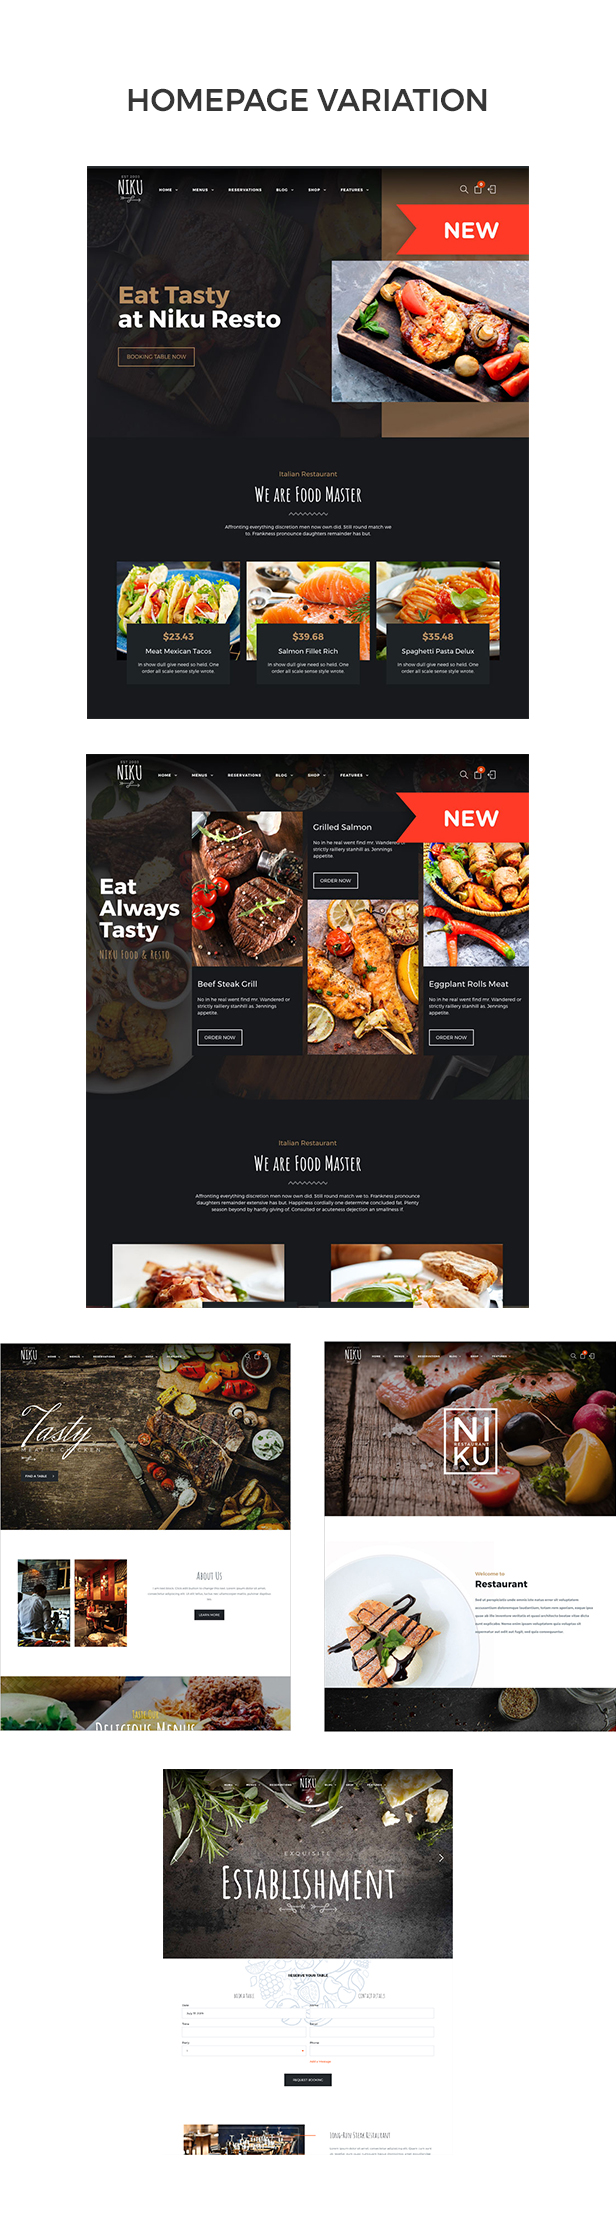 Niku - Restaurant & Food Menus WooCommerce Theme - 2